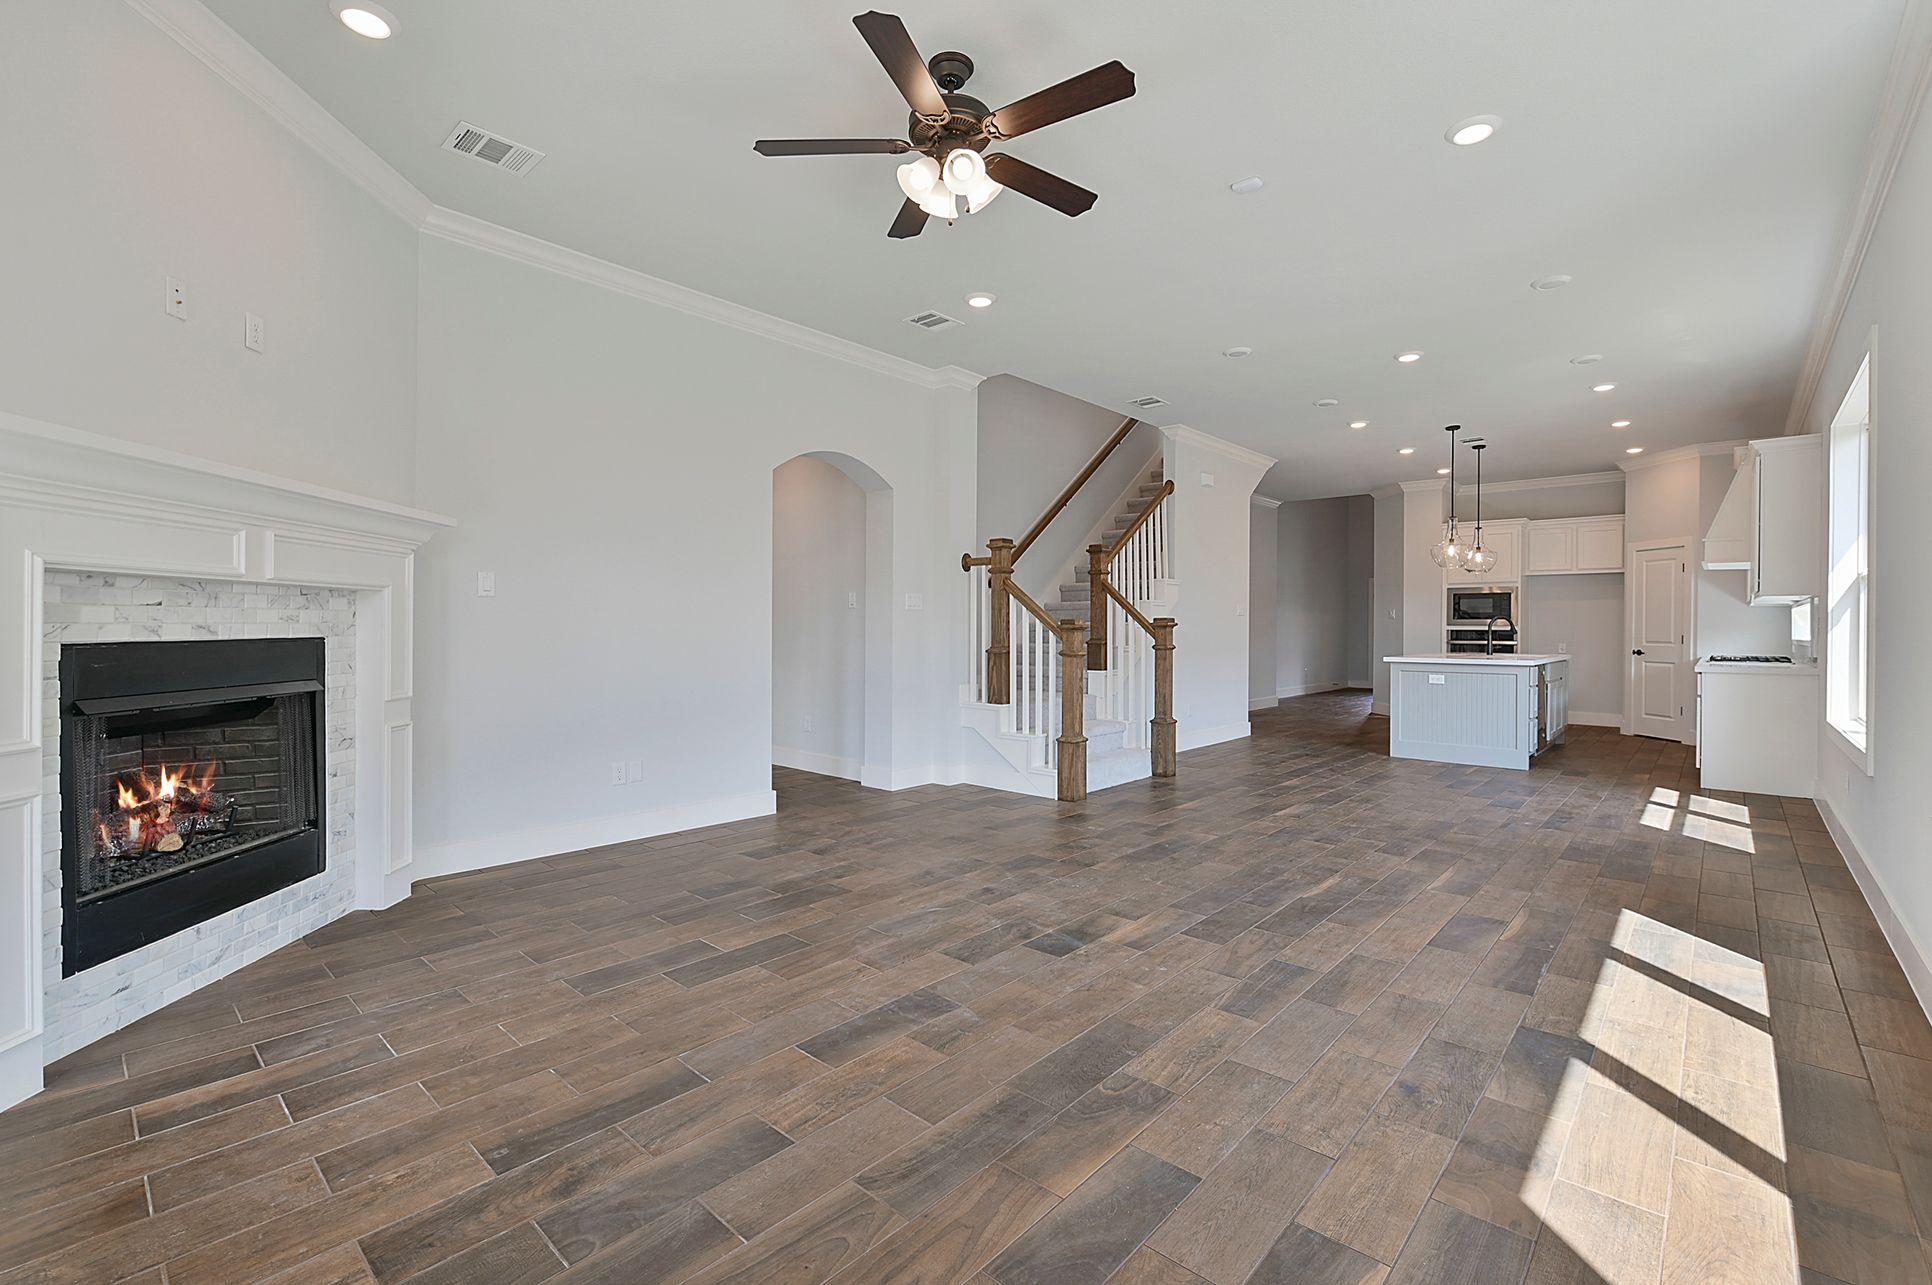 Norah Floor Plan - Interior Concept Photo